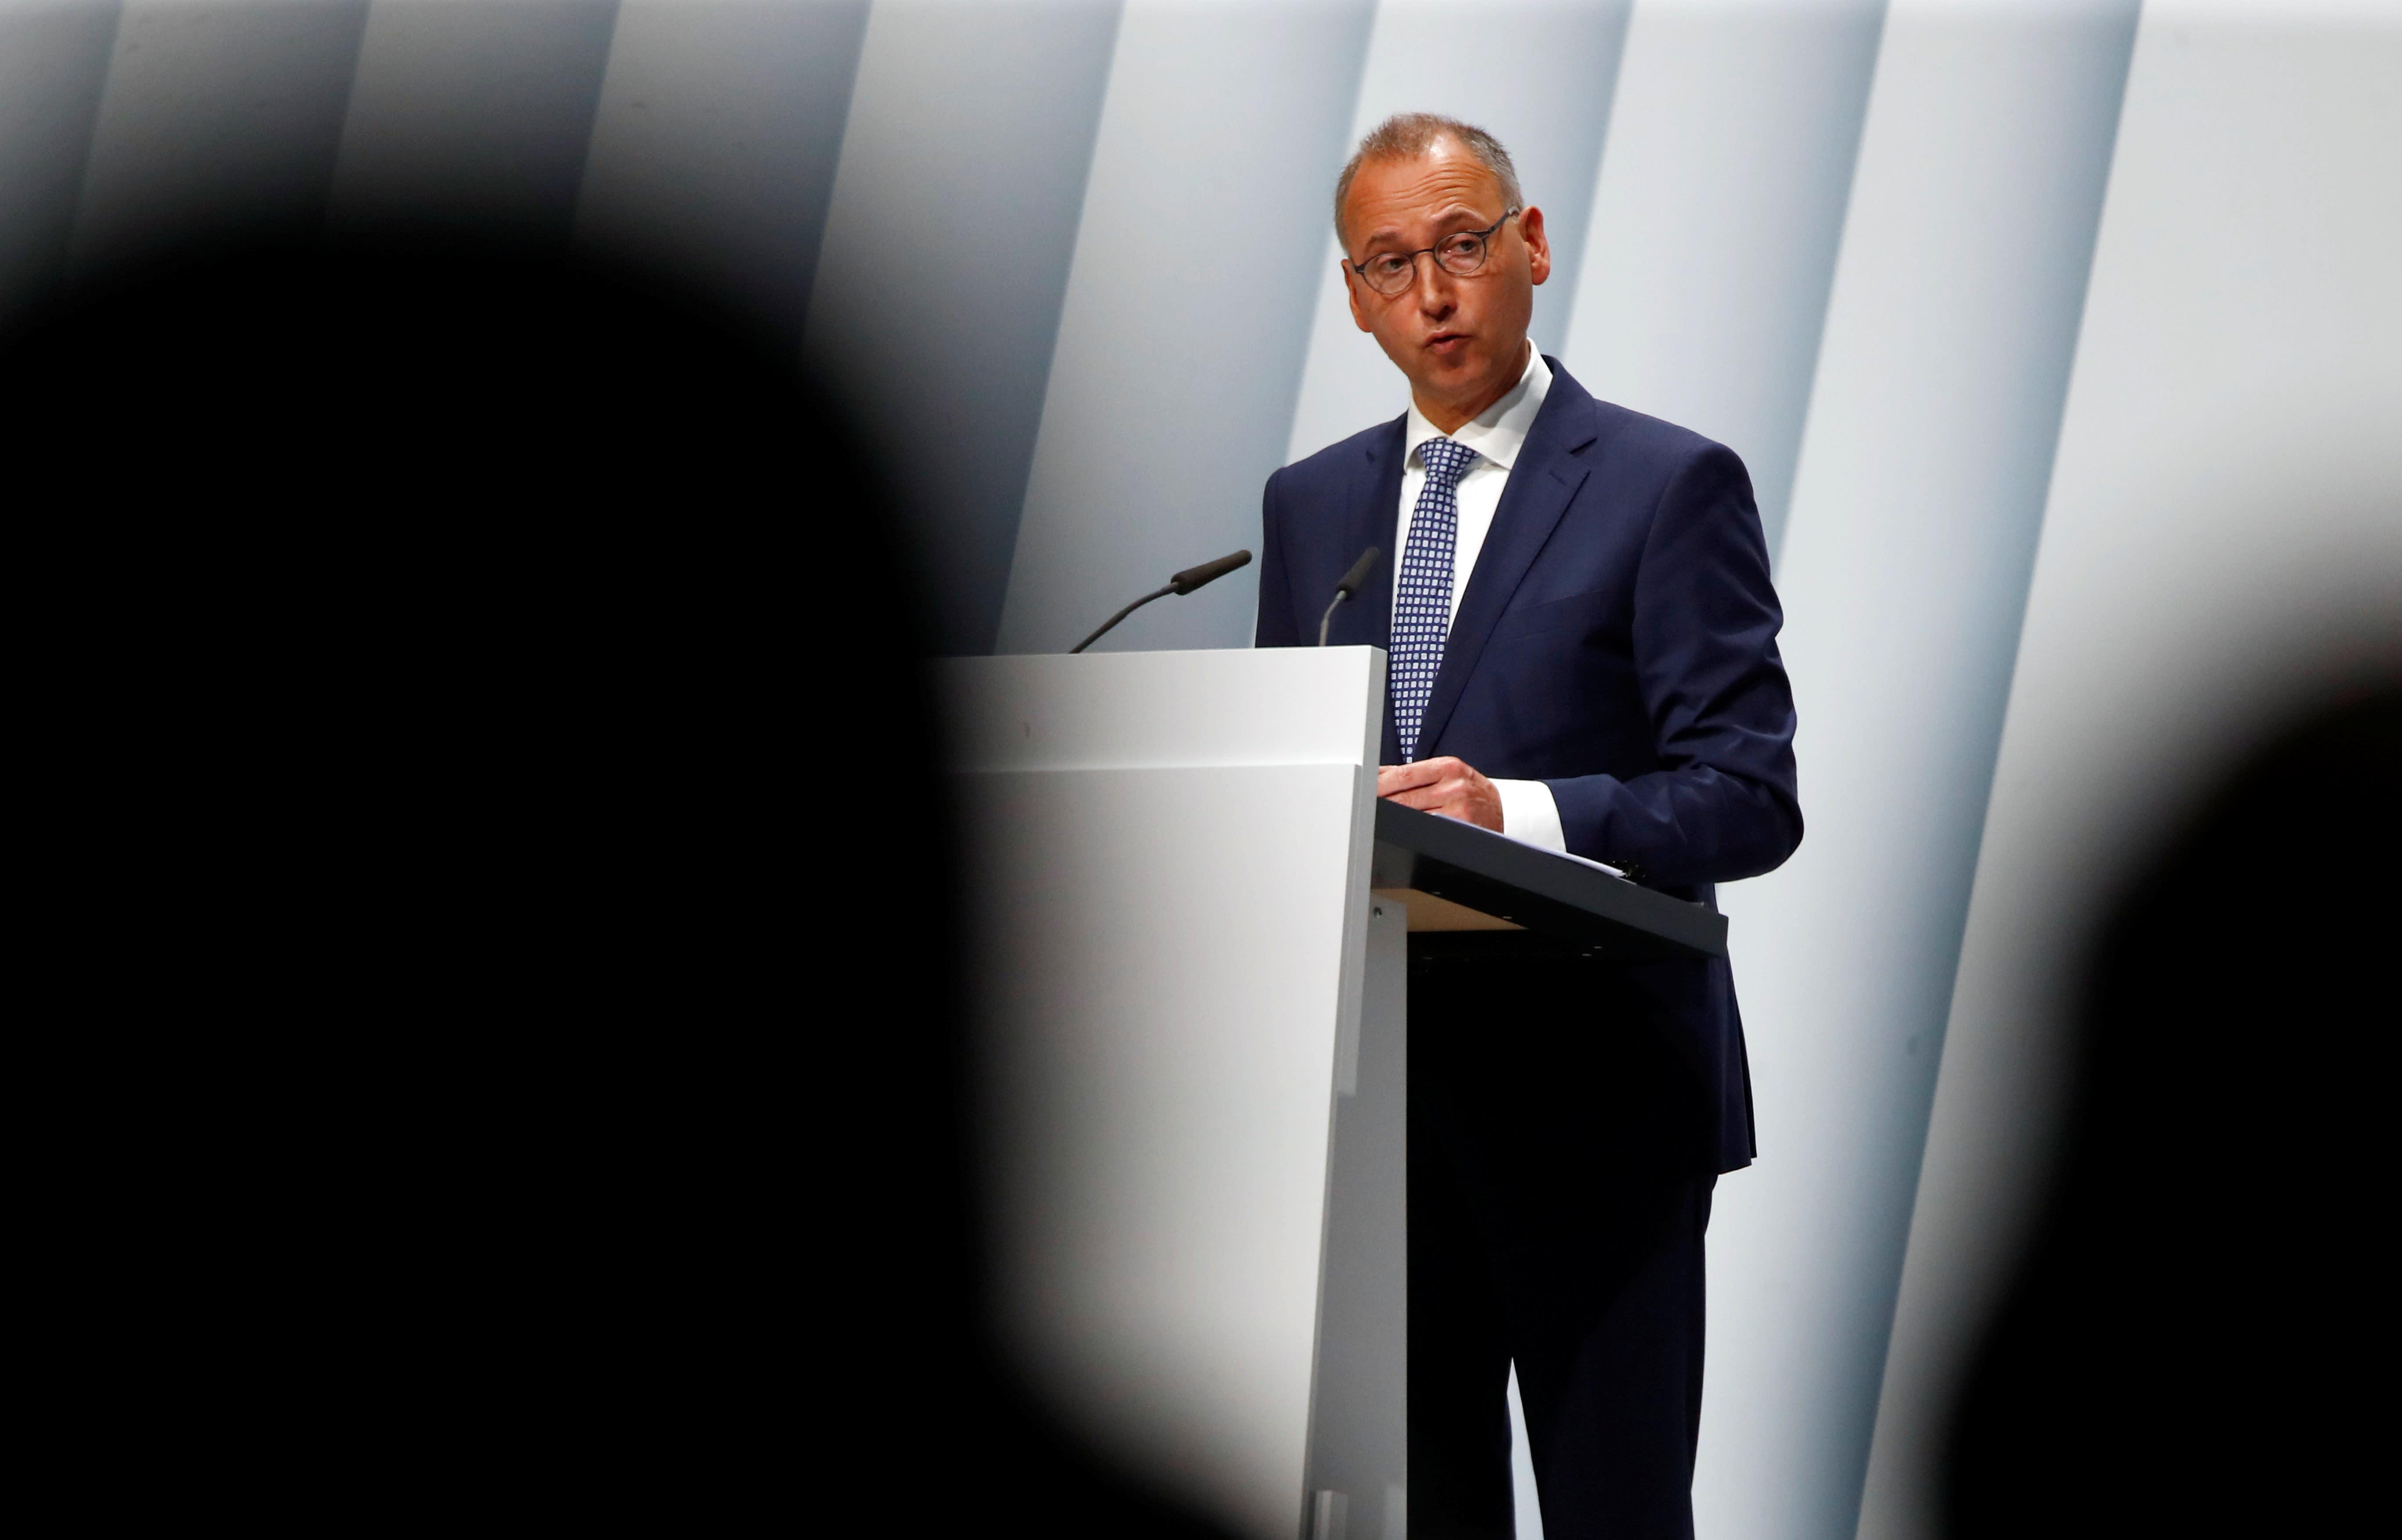 Bayer CEO: Patient distrust of tech holds back gene-editing advances